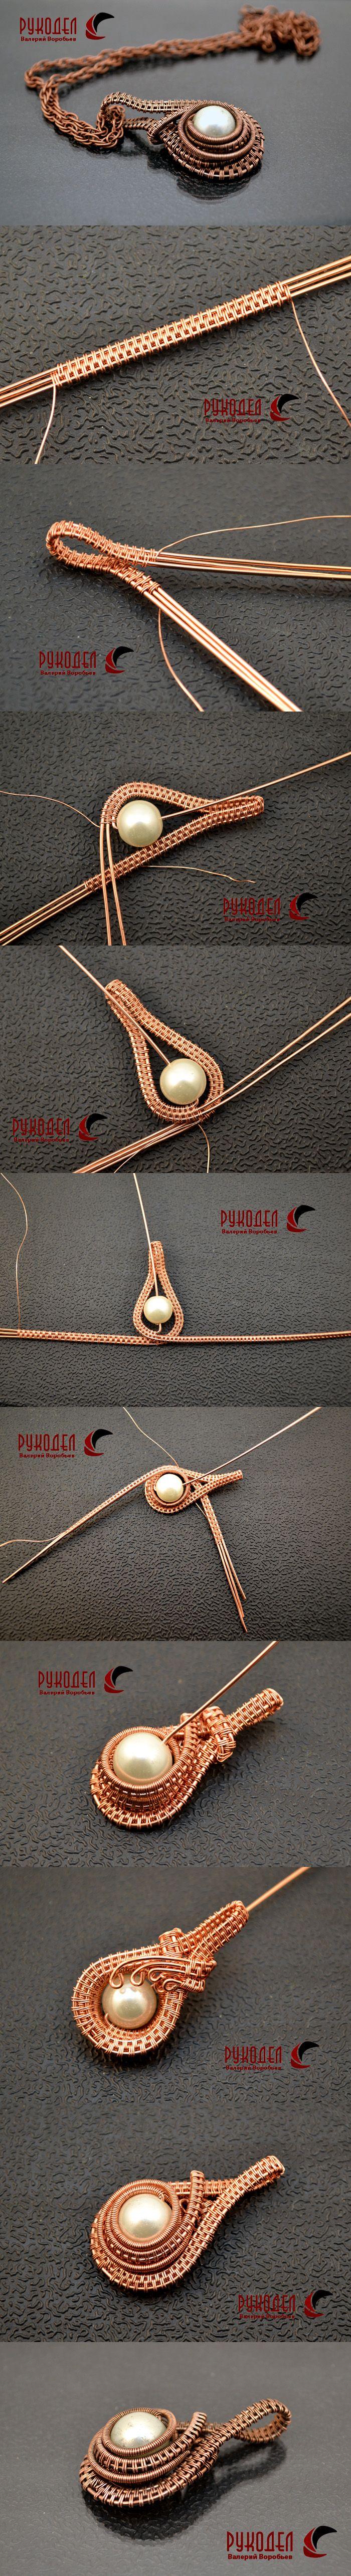 Stiff wire for crafts - Stiff Wire For Crafts Wire Wrap Pendant Download